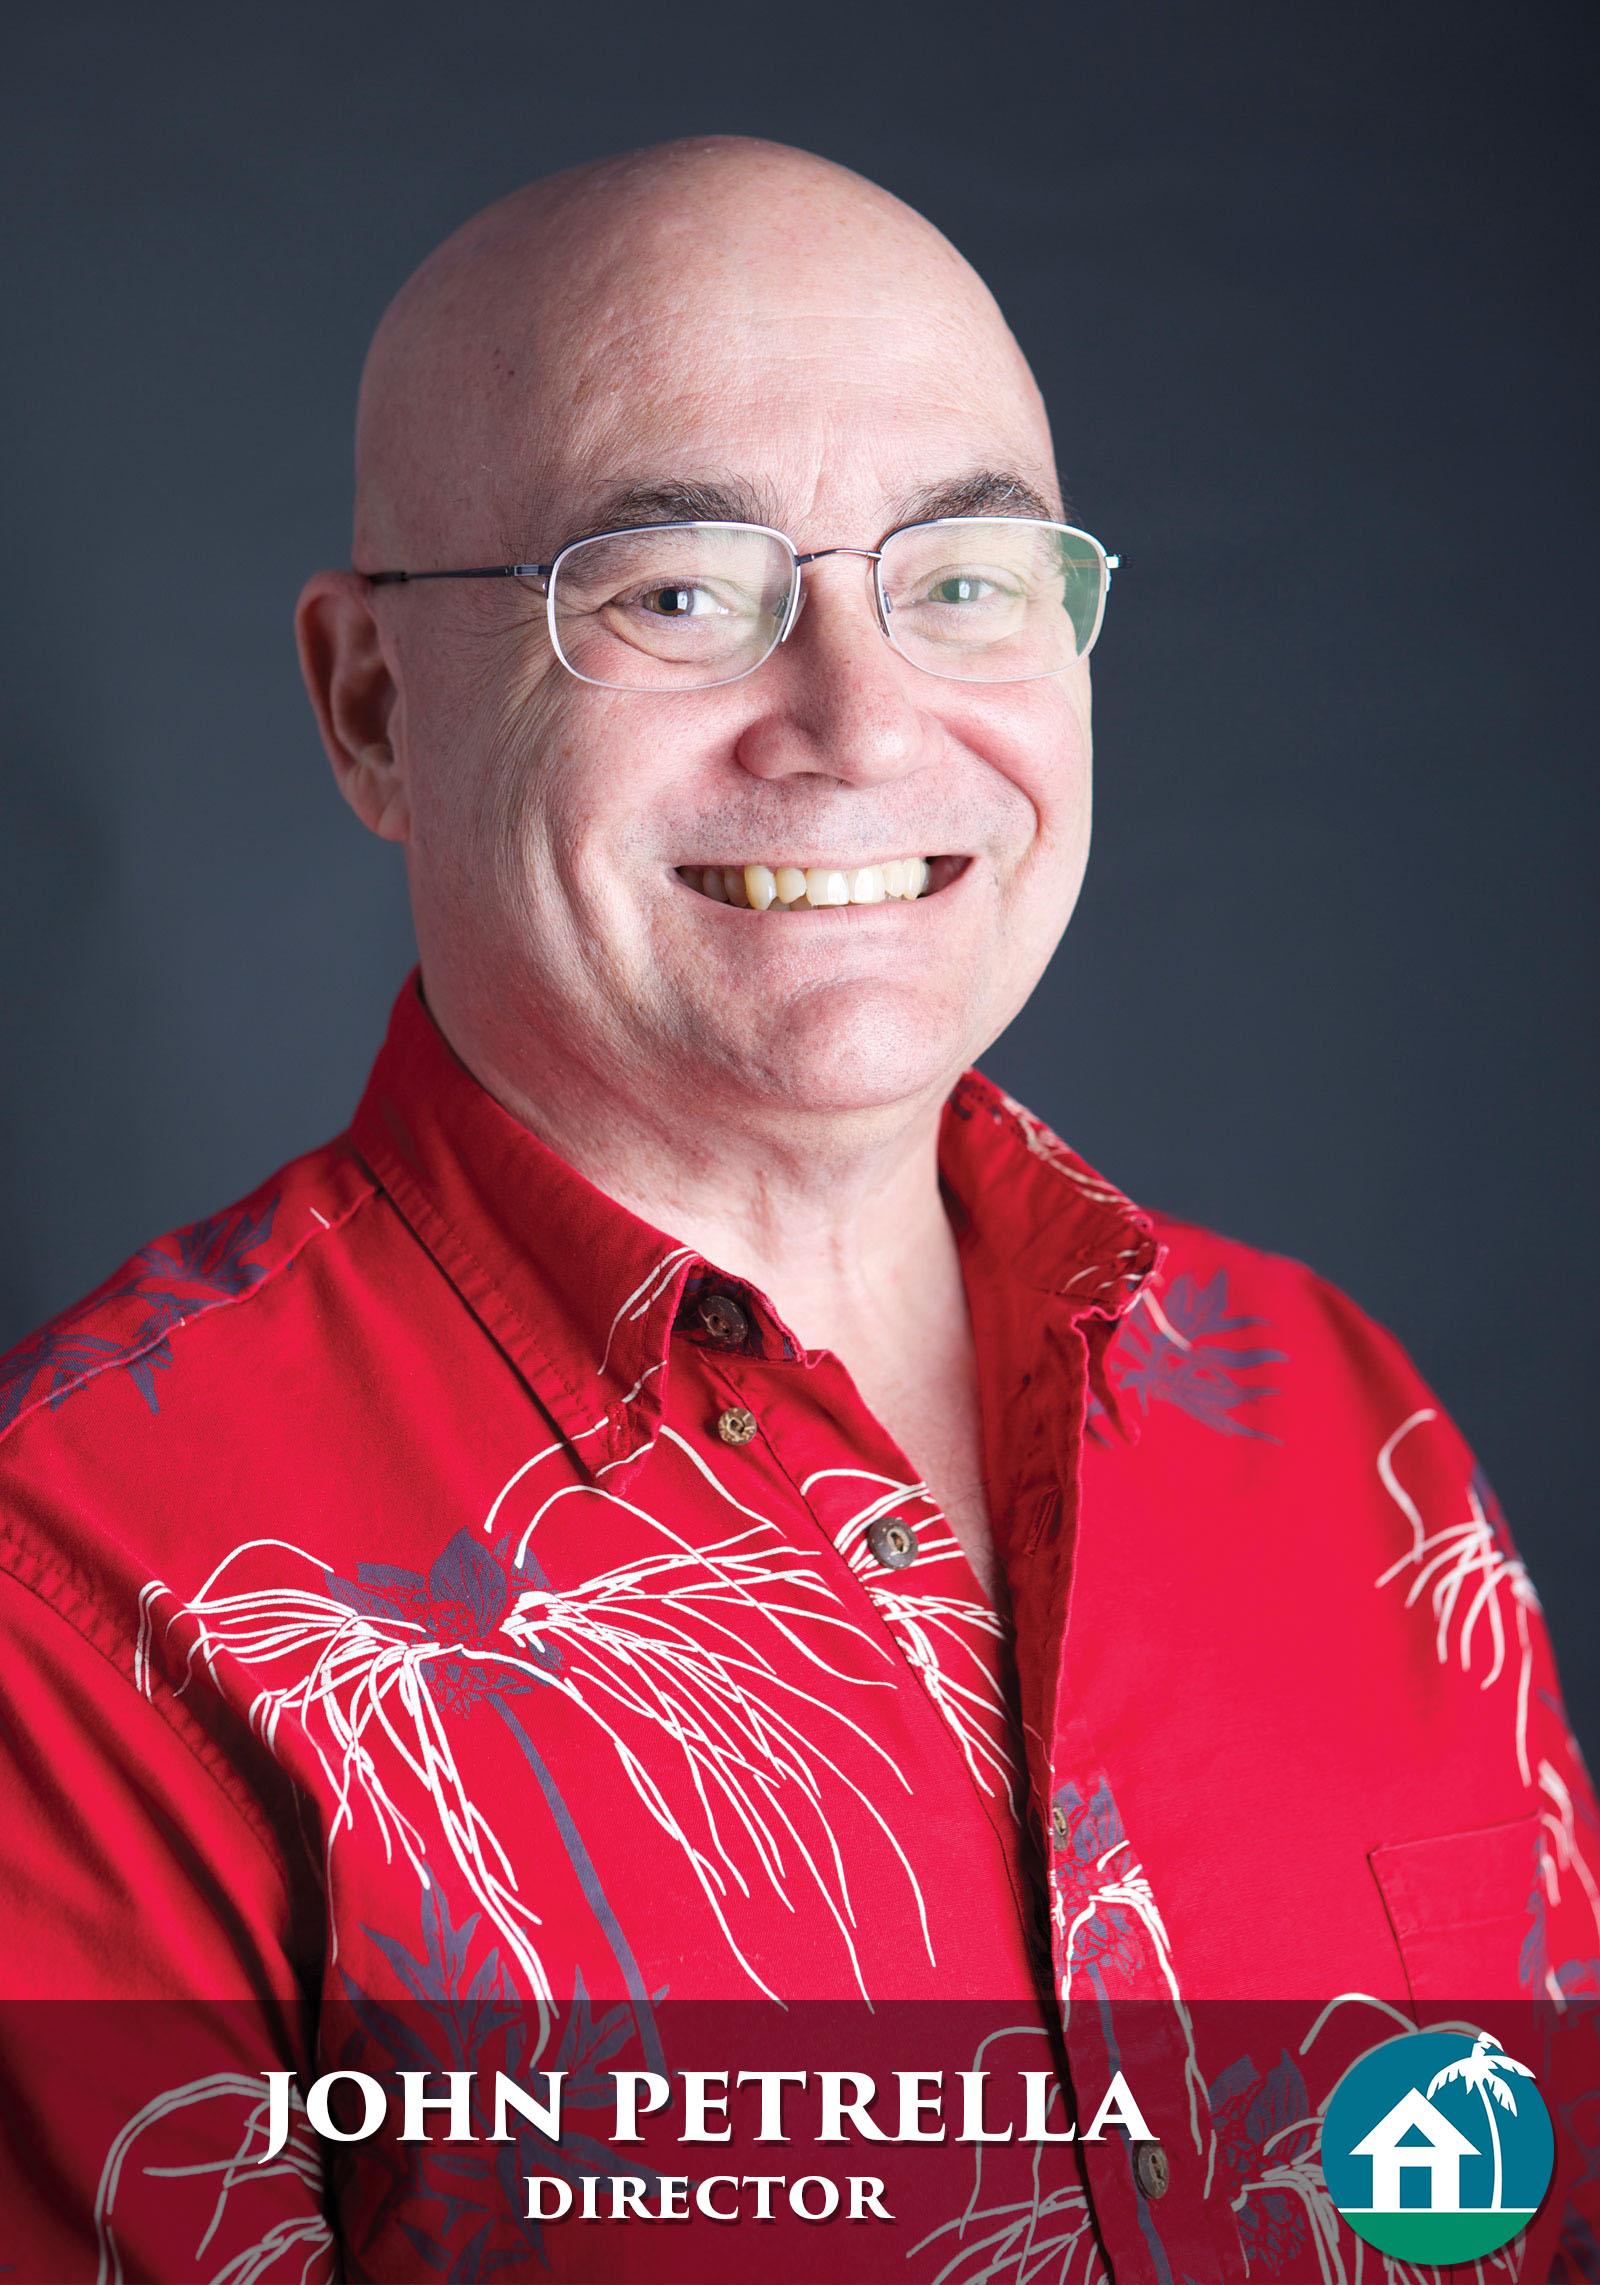 Board of Director, John Petrella, on behalf of Hawaii Information Service